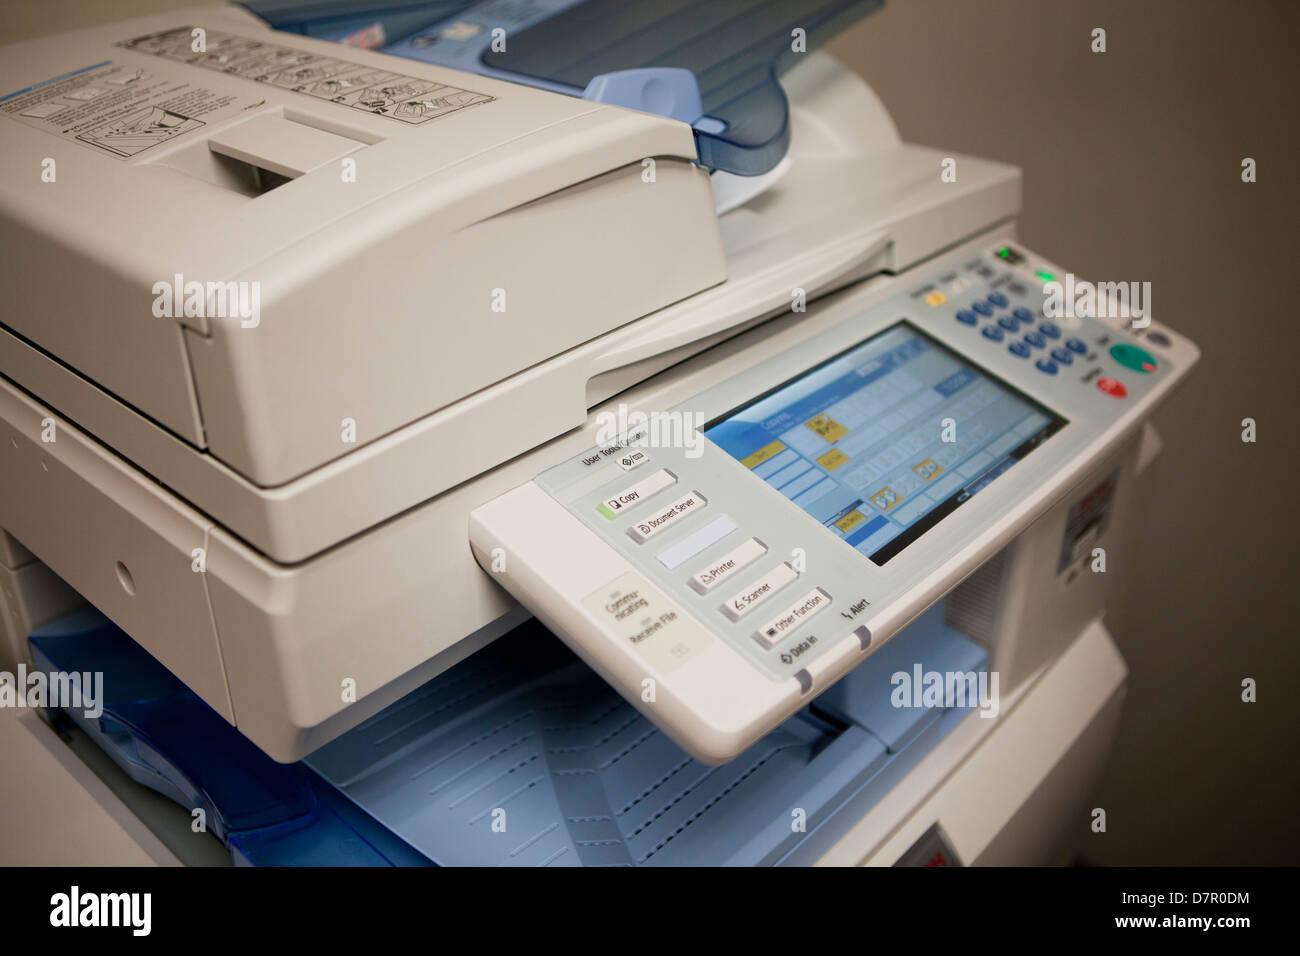 Copiadora de oficina Imagen De Stock